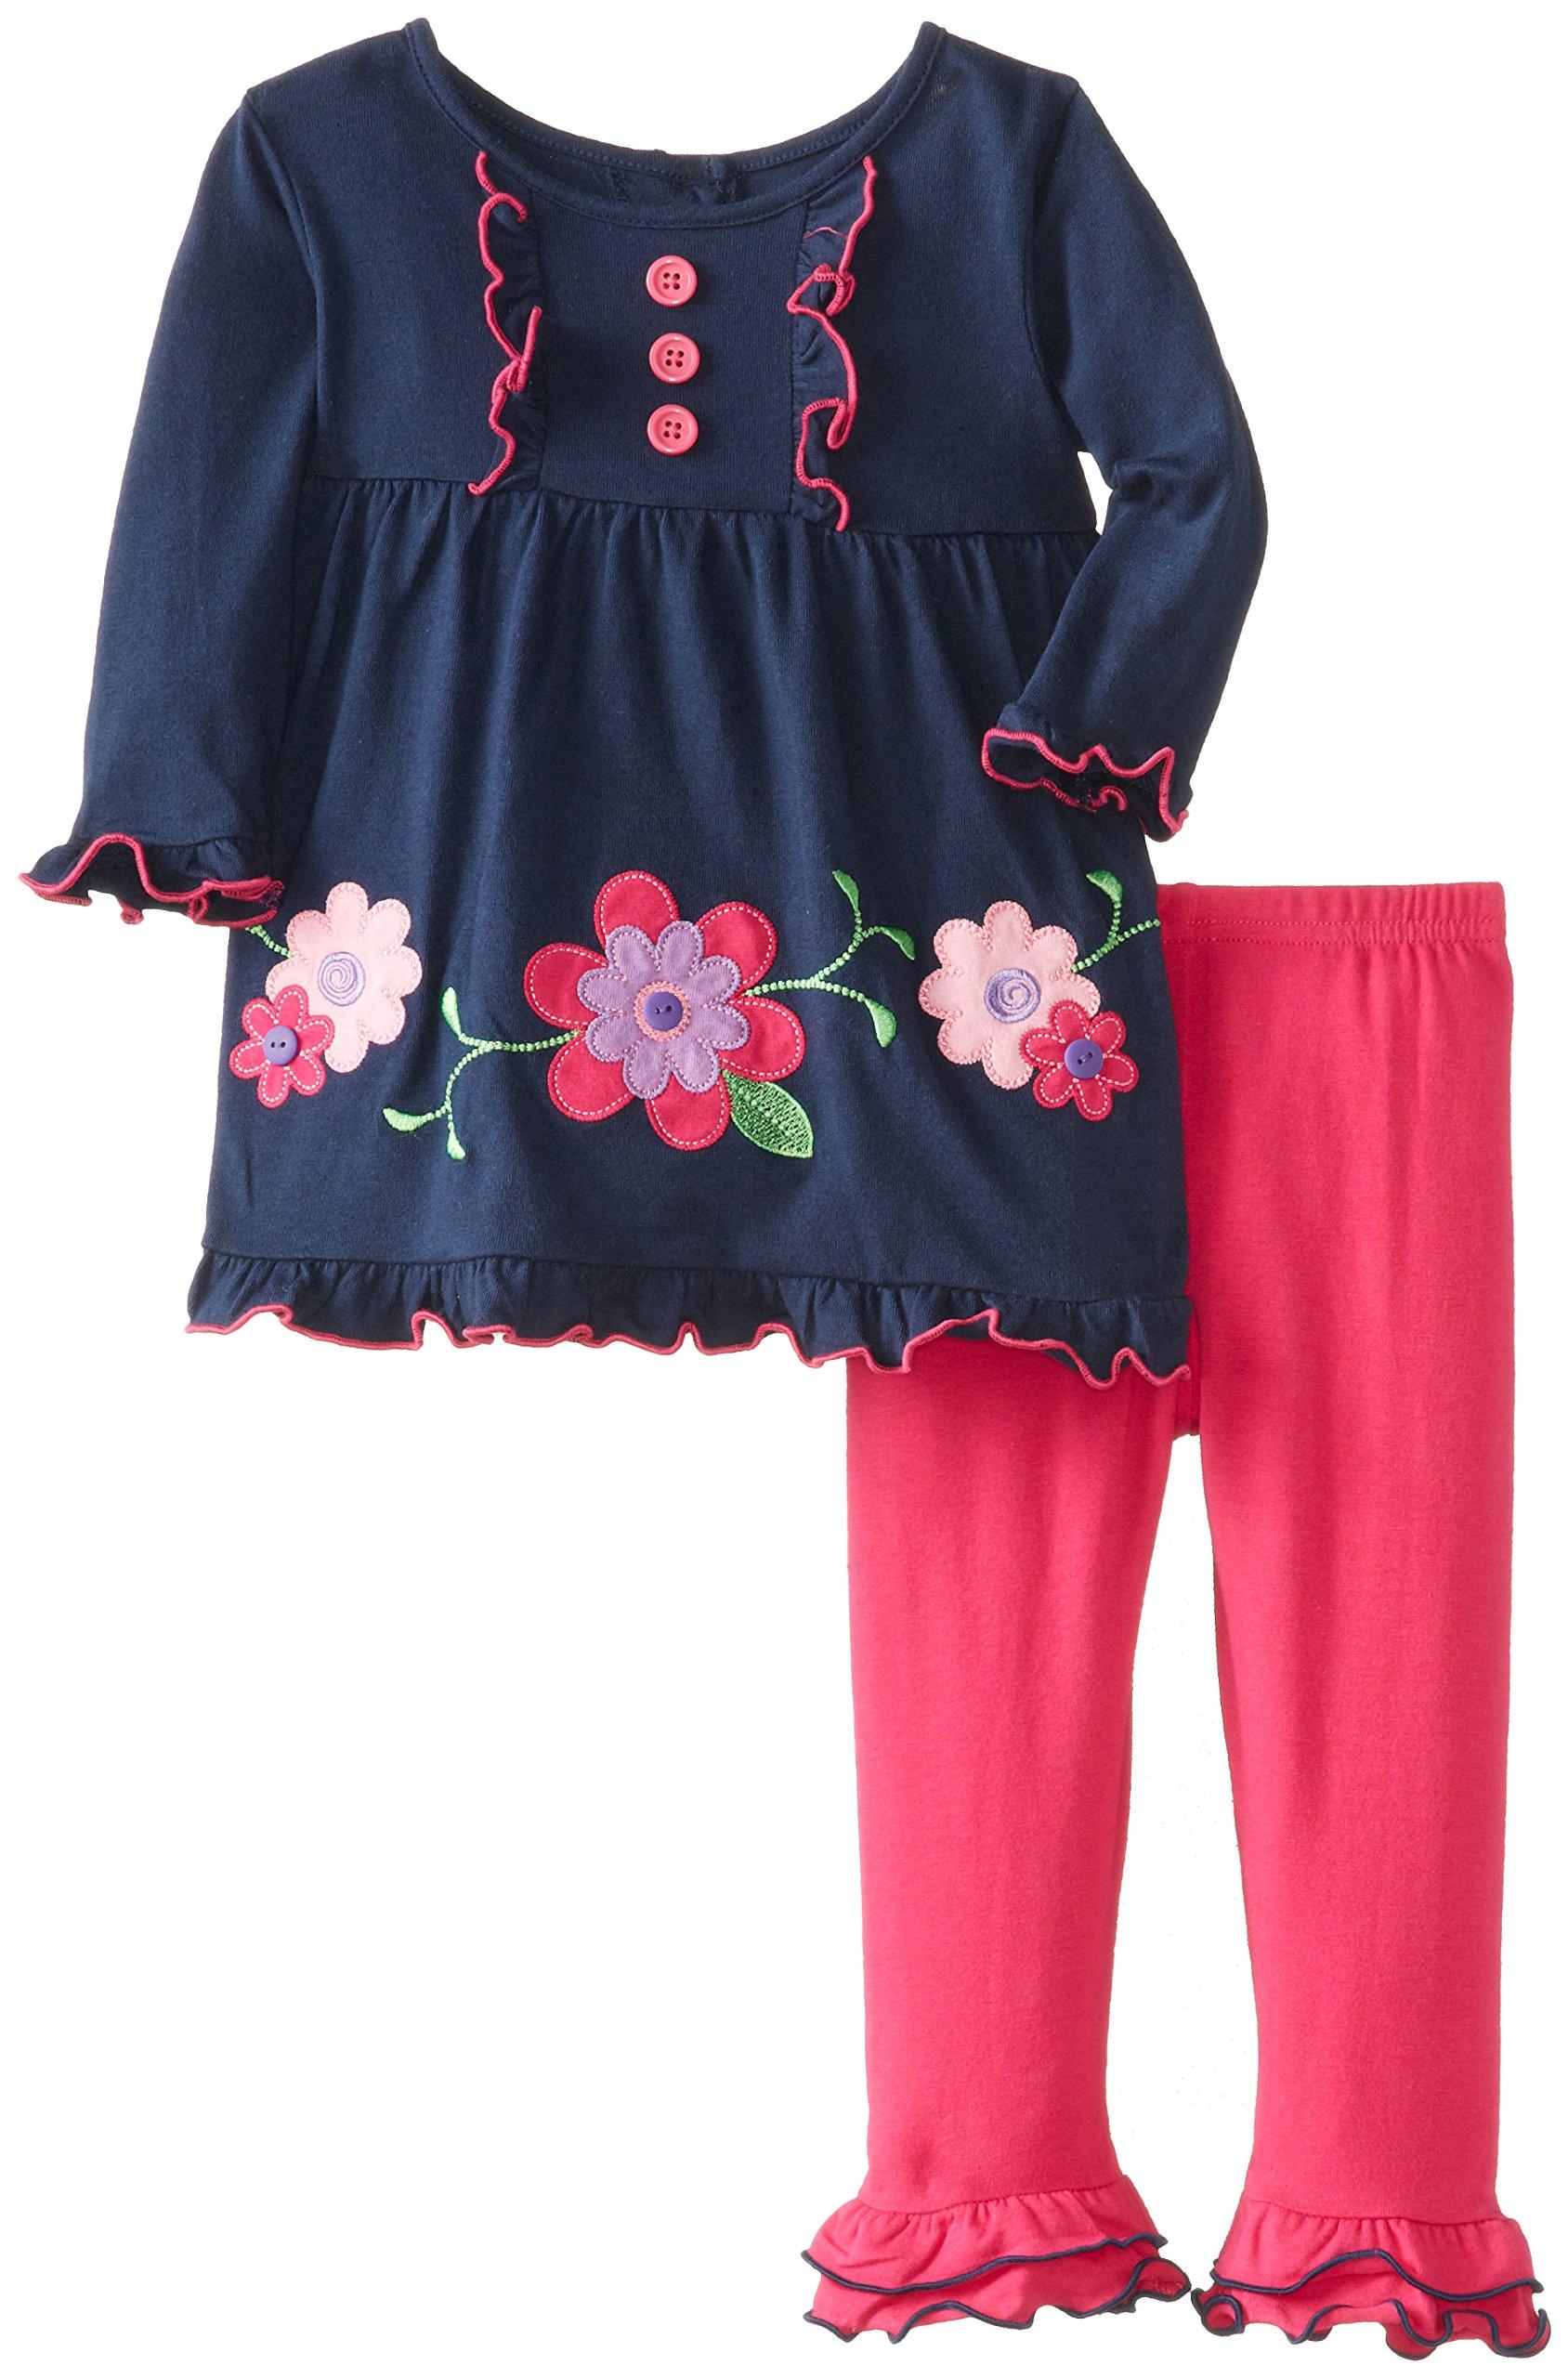 Good Lad Baby Girls' Flower Applique Legging Set, Navy, 12 Months